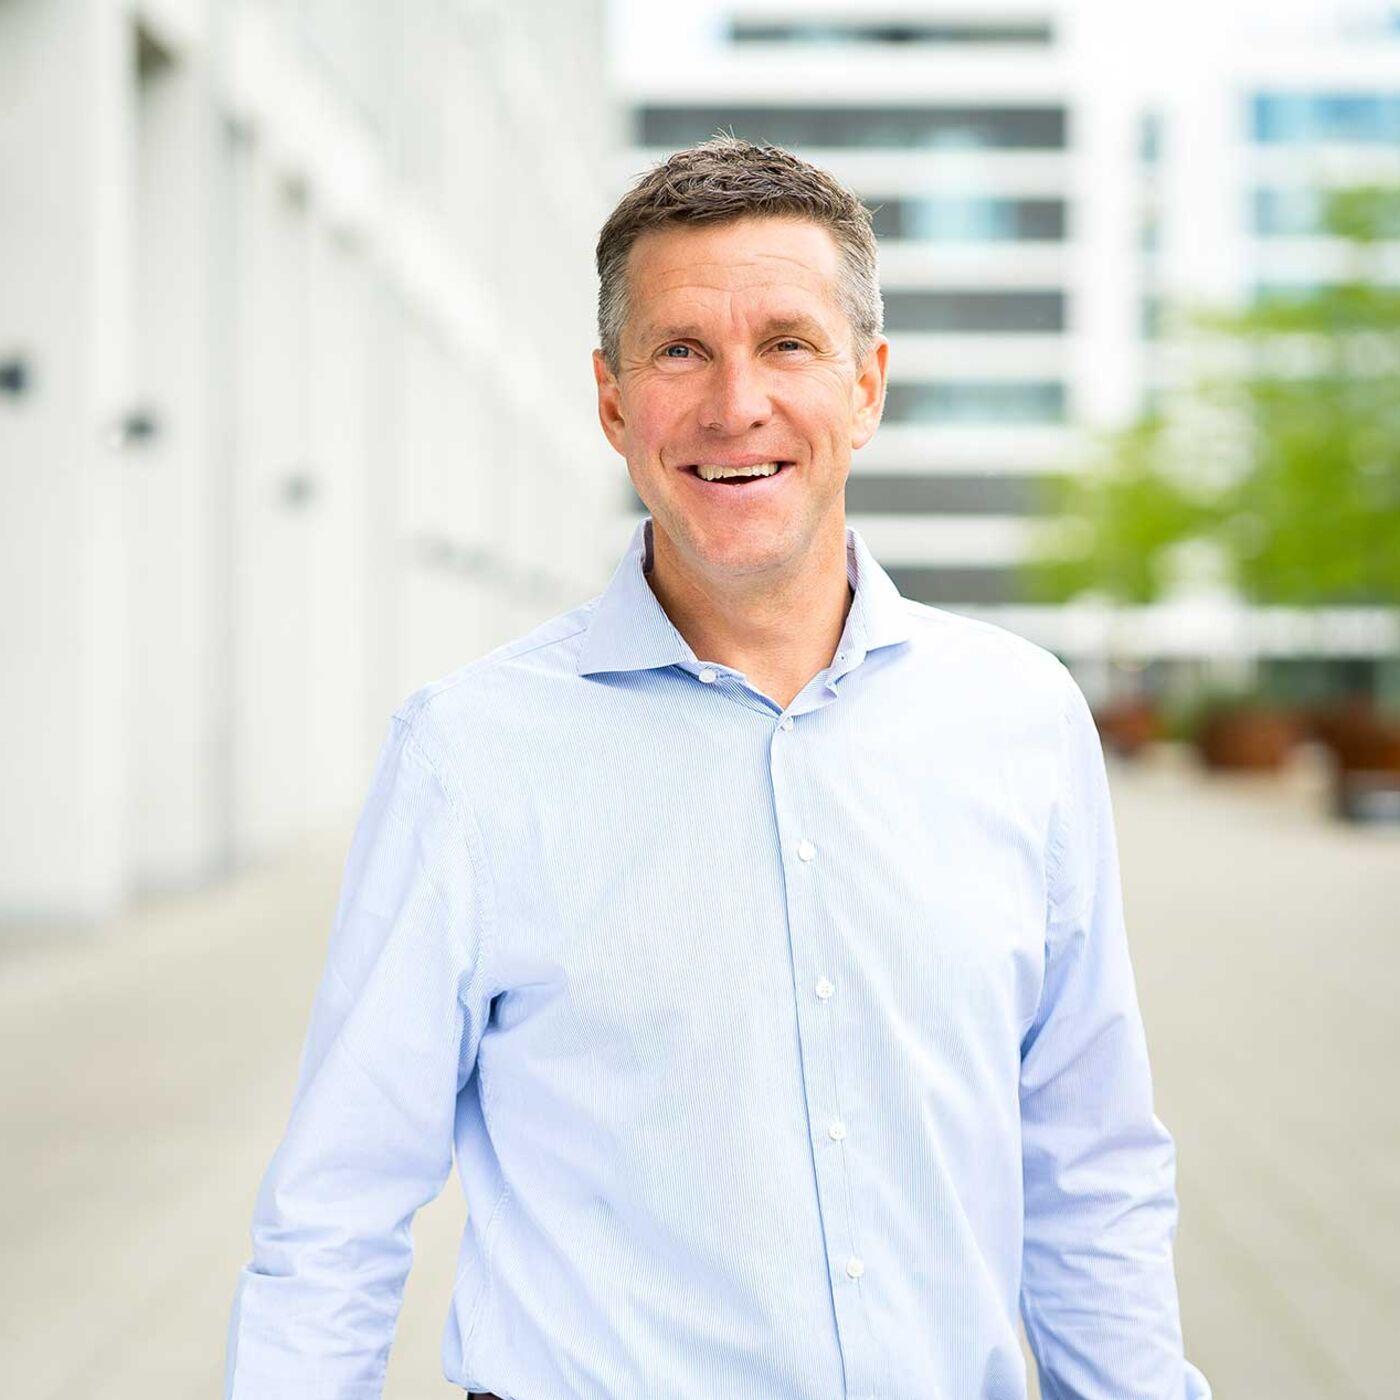 Stephan Sieber CEO of Transporeon